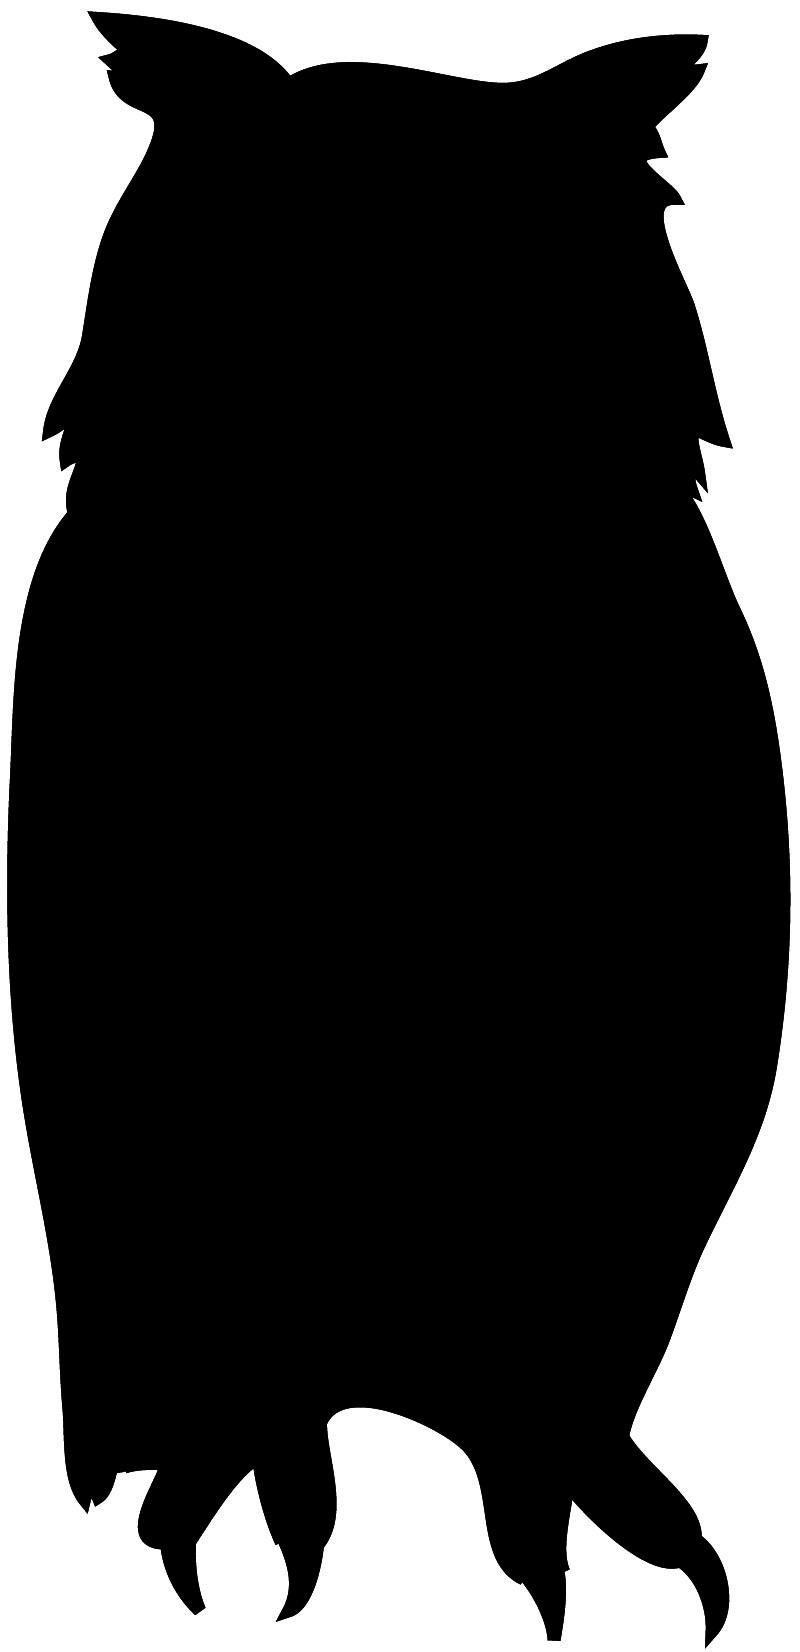 Owlet clipart silhouette Owl Art silhouette in Owl